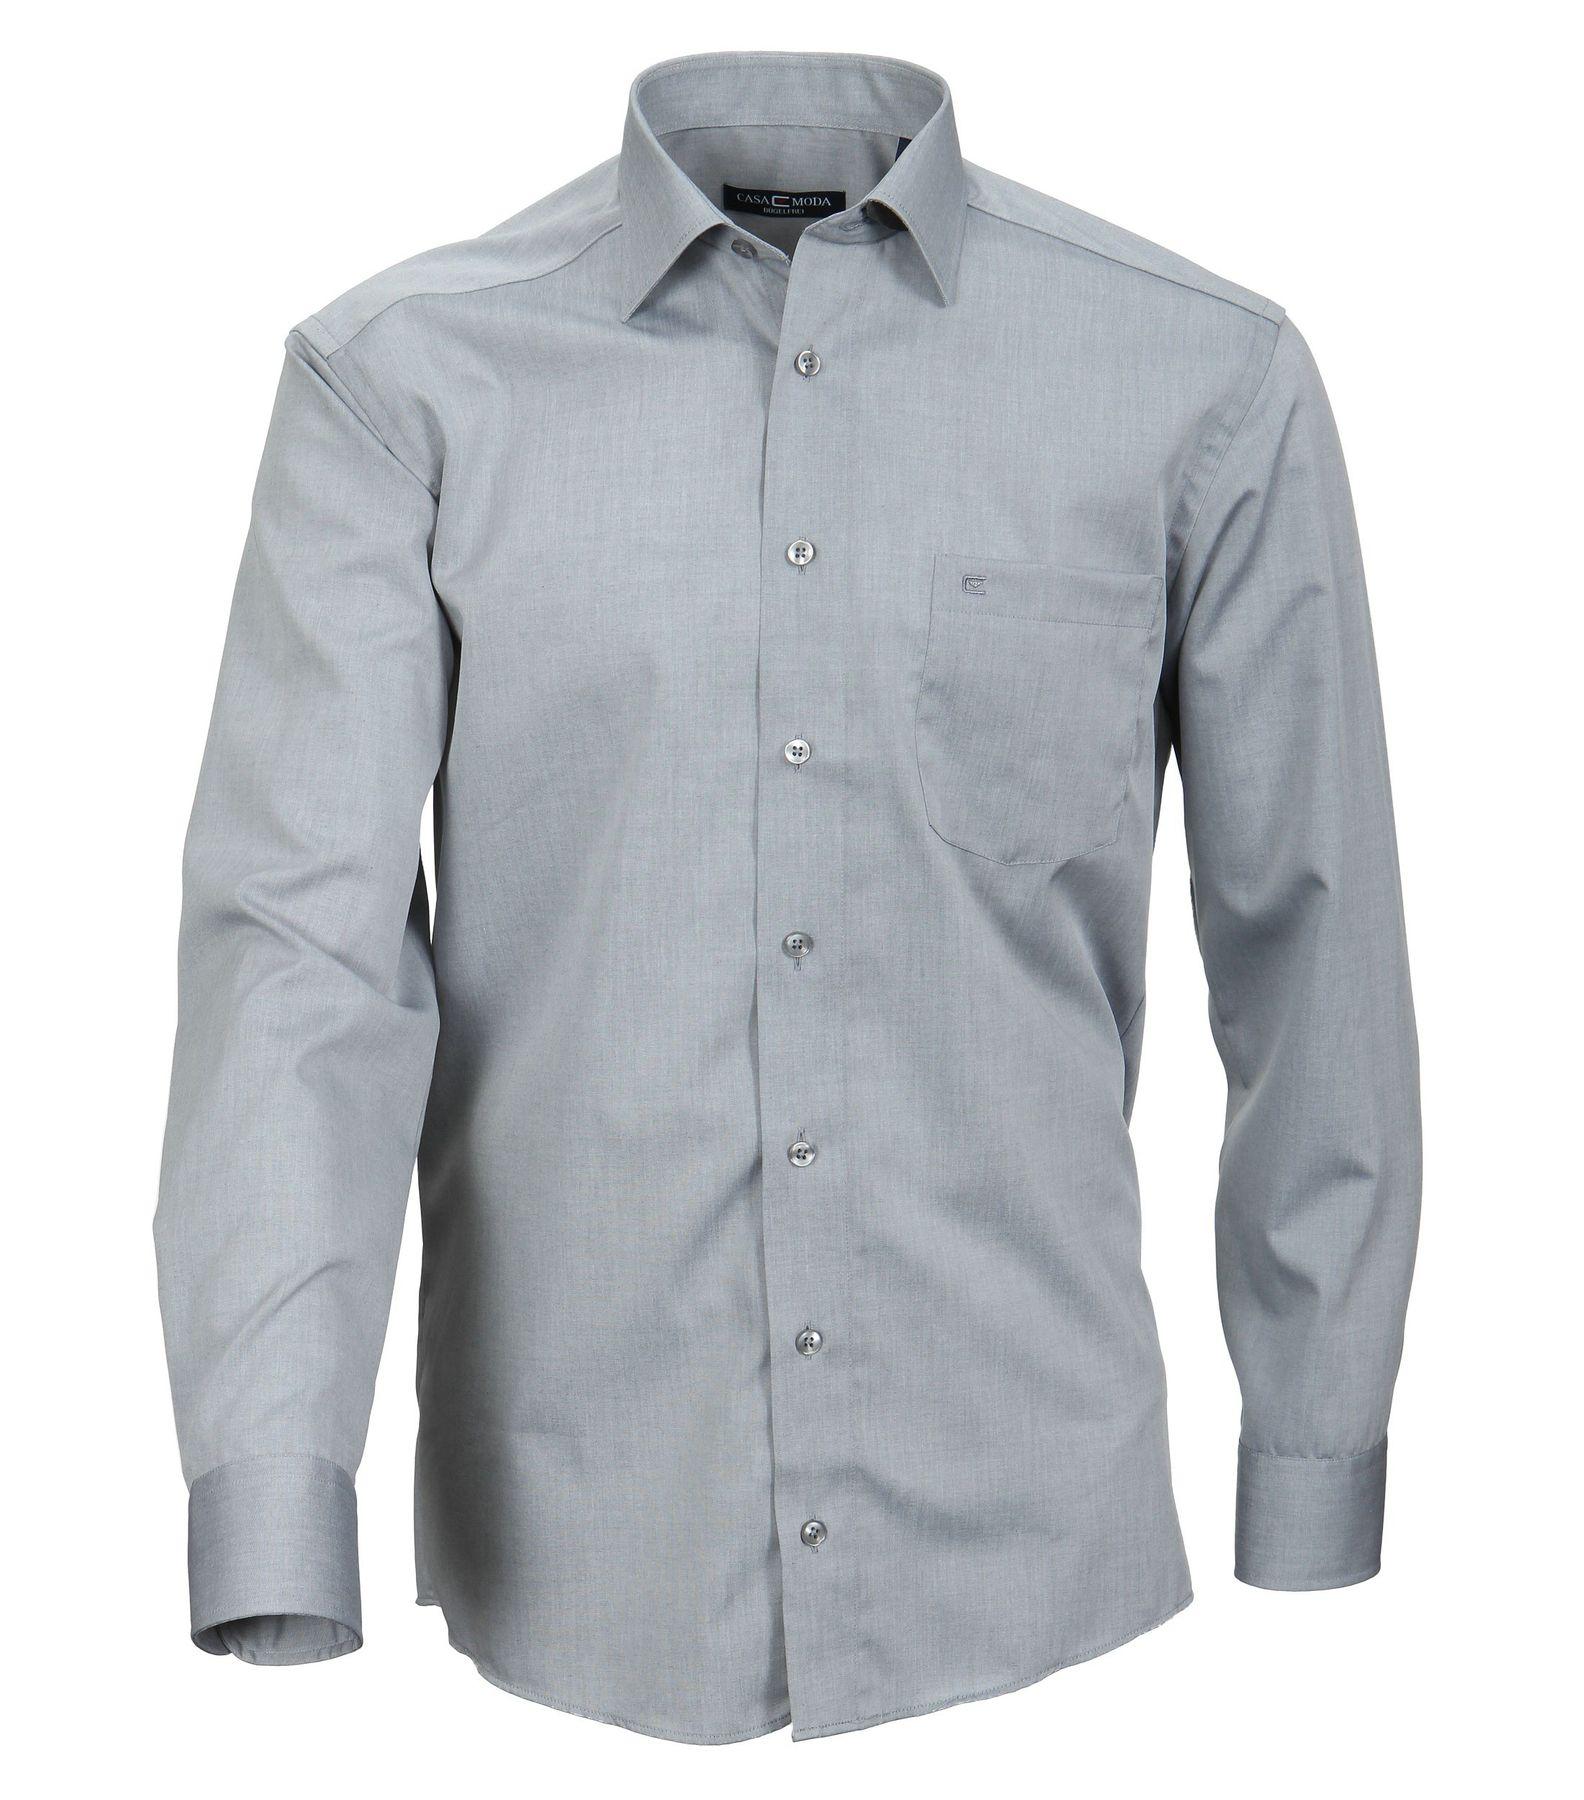 Casa Moda - Comfort Fit - Bügelfreies Herren Business Hemd mit Extra langem Arm (69cm) in verschiedenen Farben (006069)